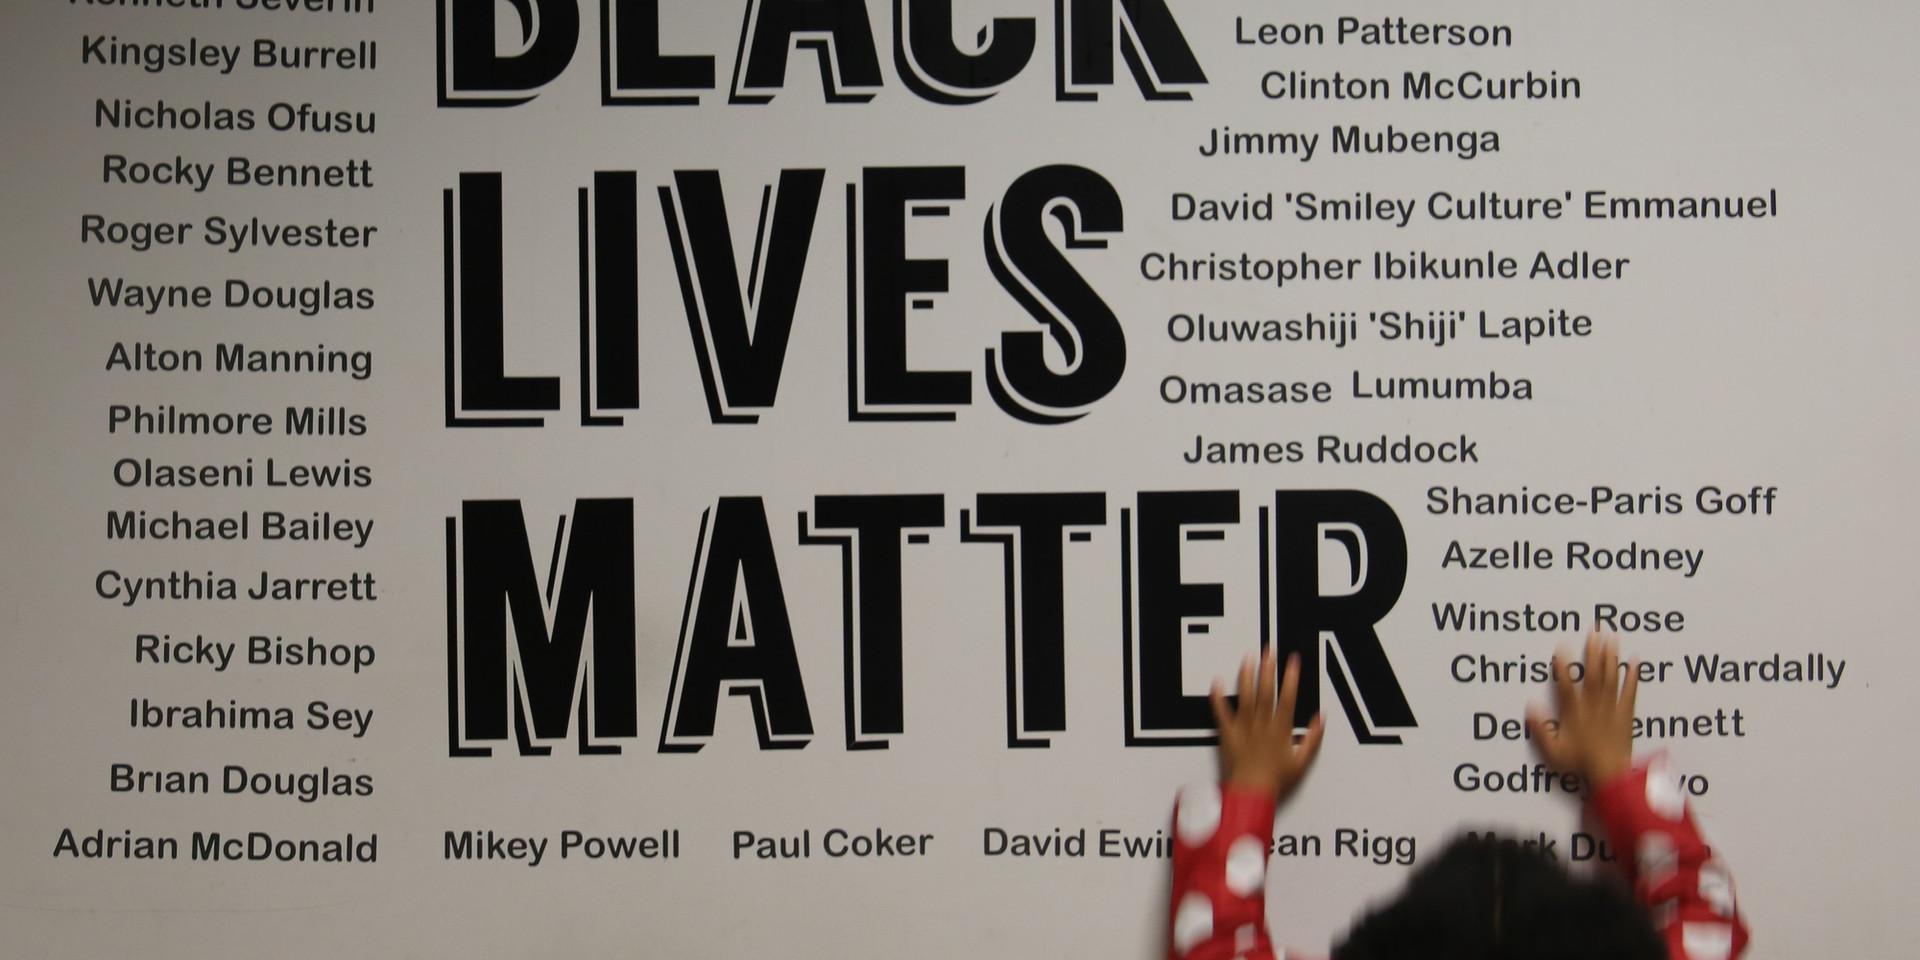 Black Lives Matter - Goldsmiths Student Union